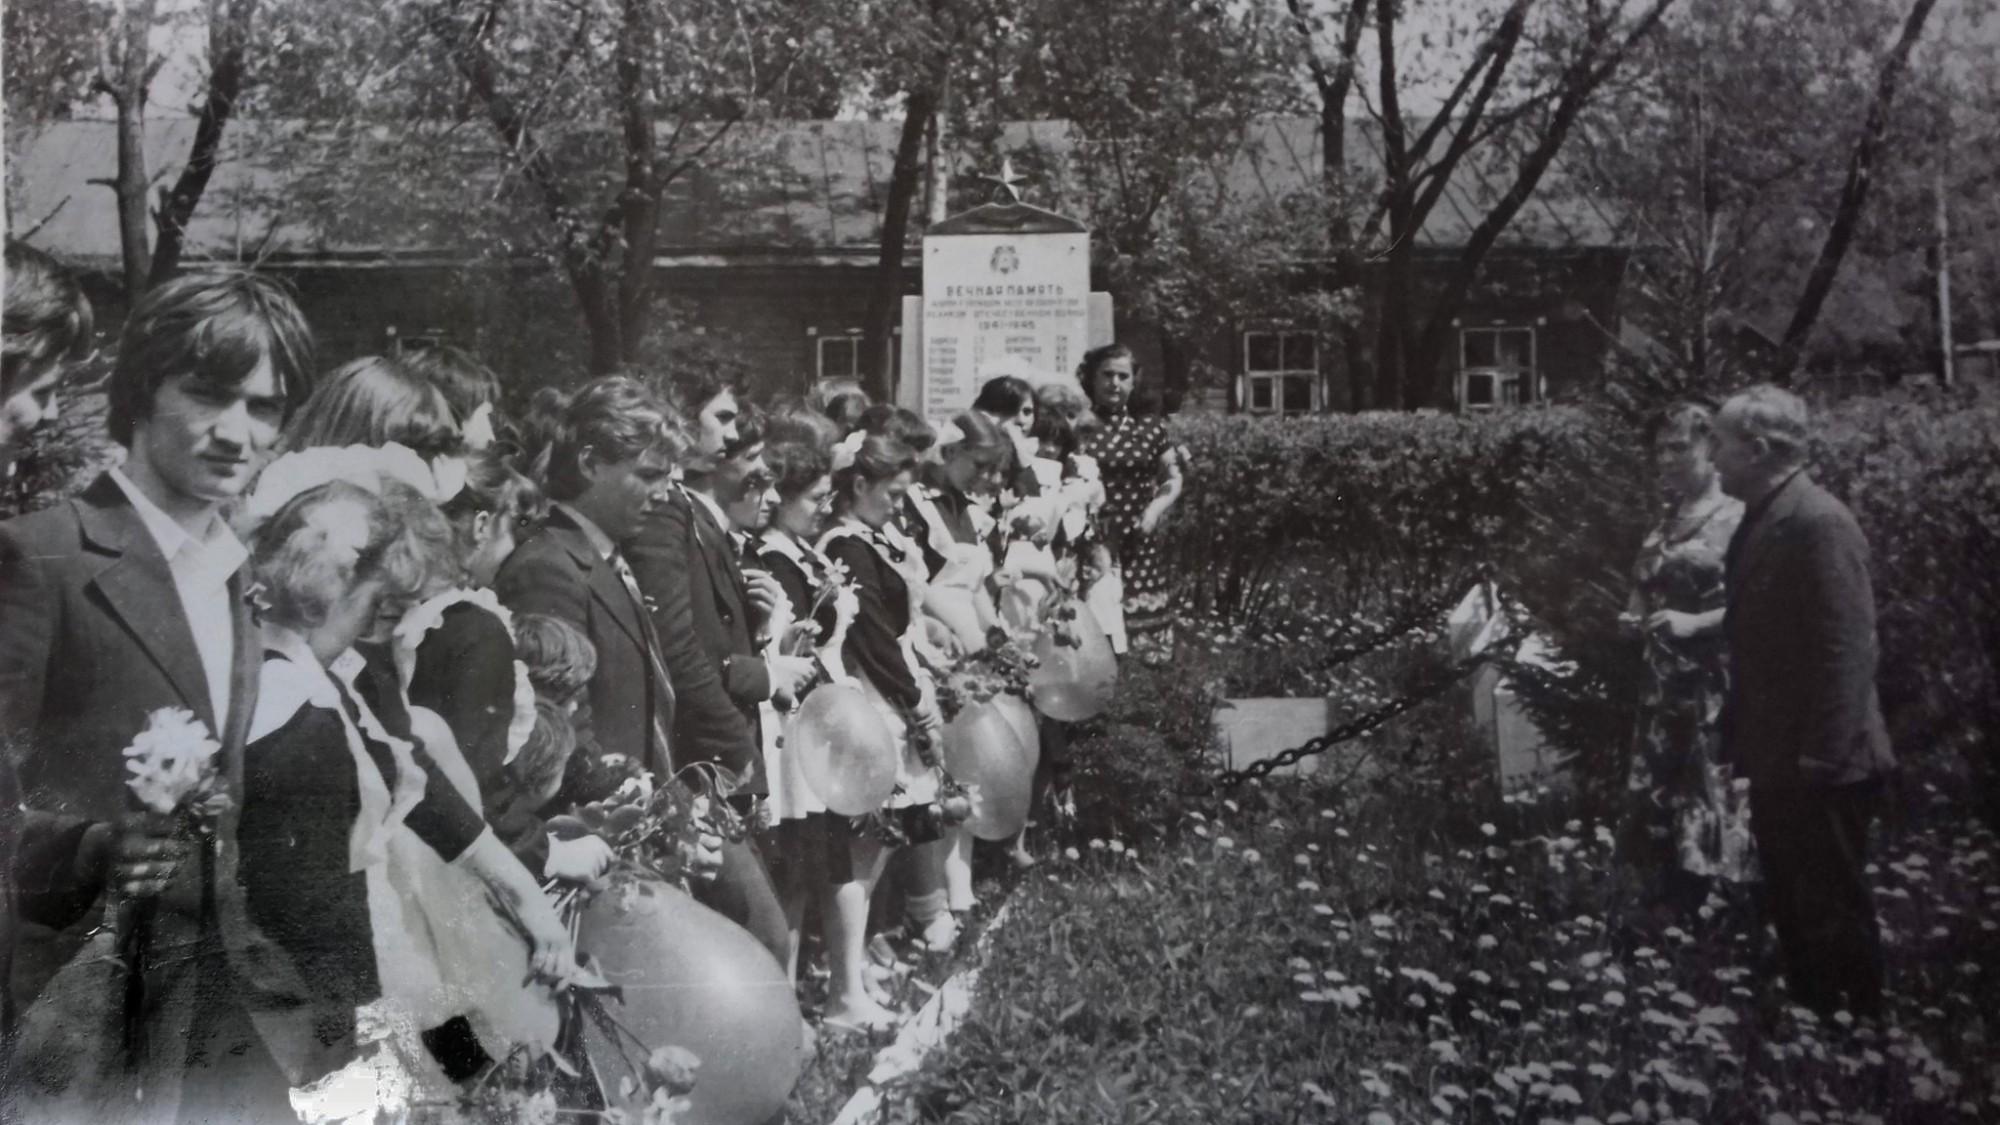 1982 последний звонок.могила неизвестного солдата на химбазе. На заднем плане музей боевой славы2